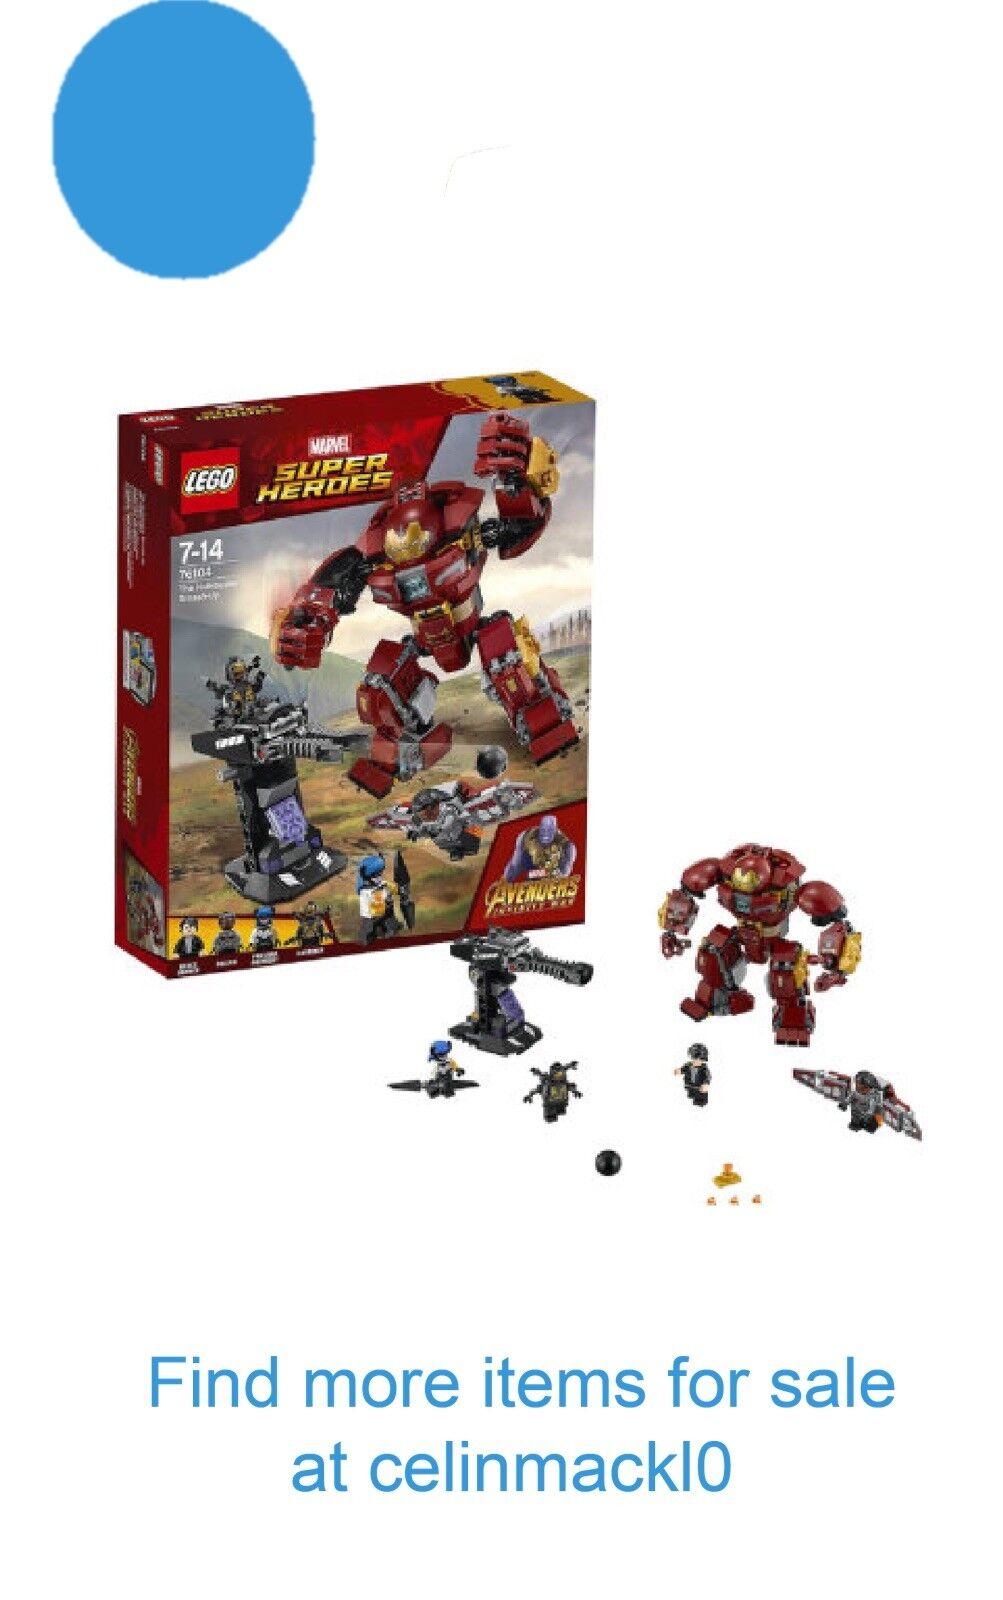 NEW LEGO Marvel Super Heroes 76104 Avengers Infinity War The Hulkbuster Smash-Up